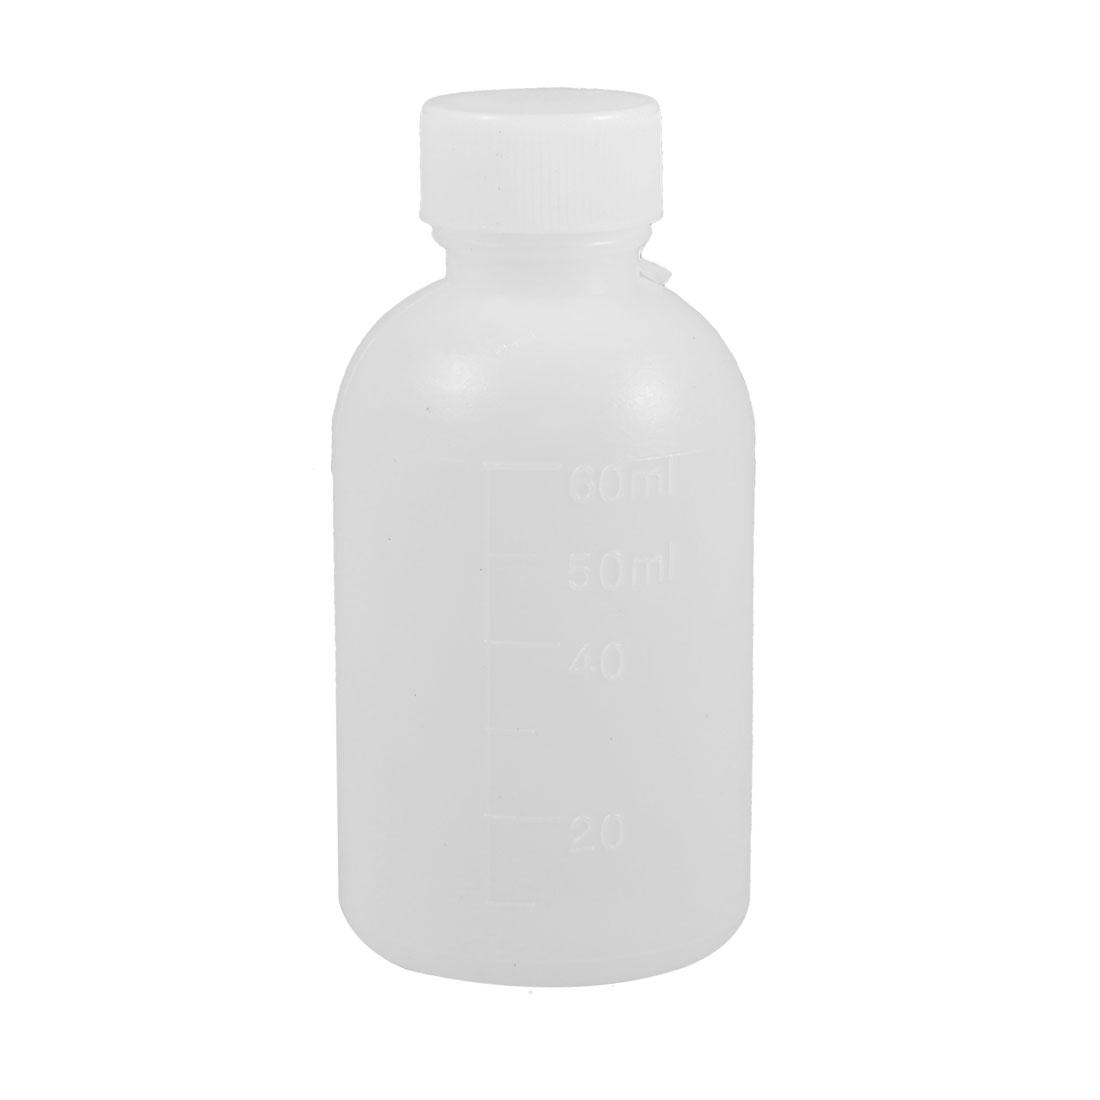 60mL Capacity Cylinder Body White Plastic Lab Measure Bottle